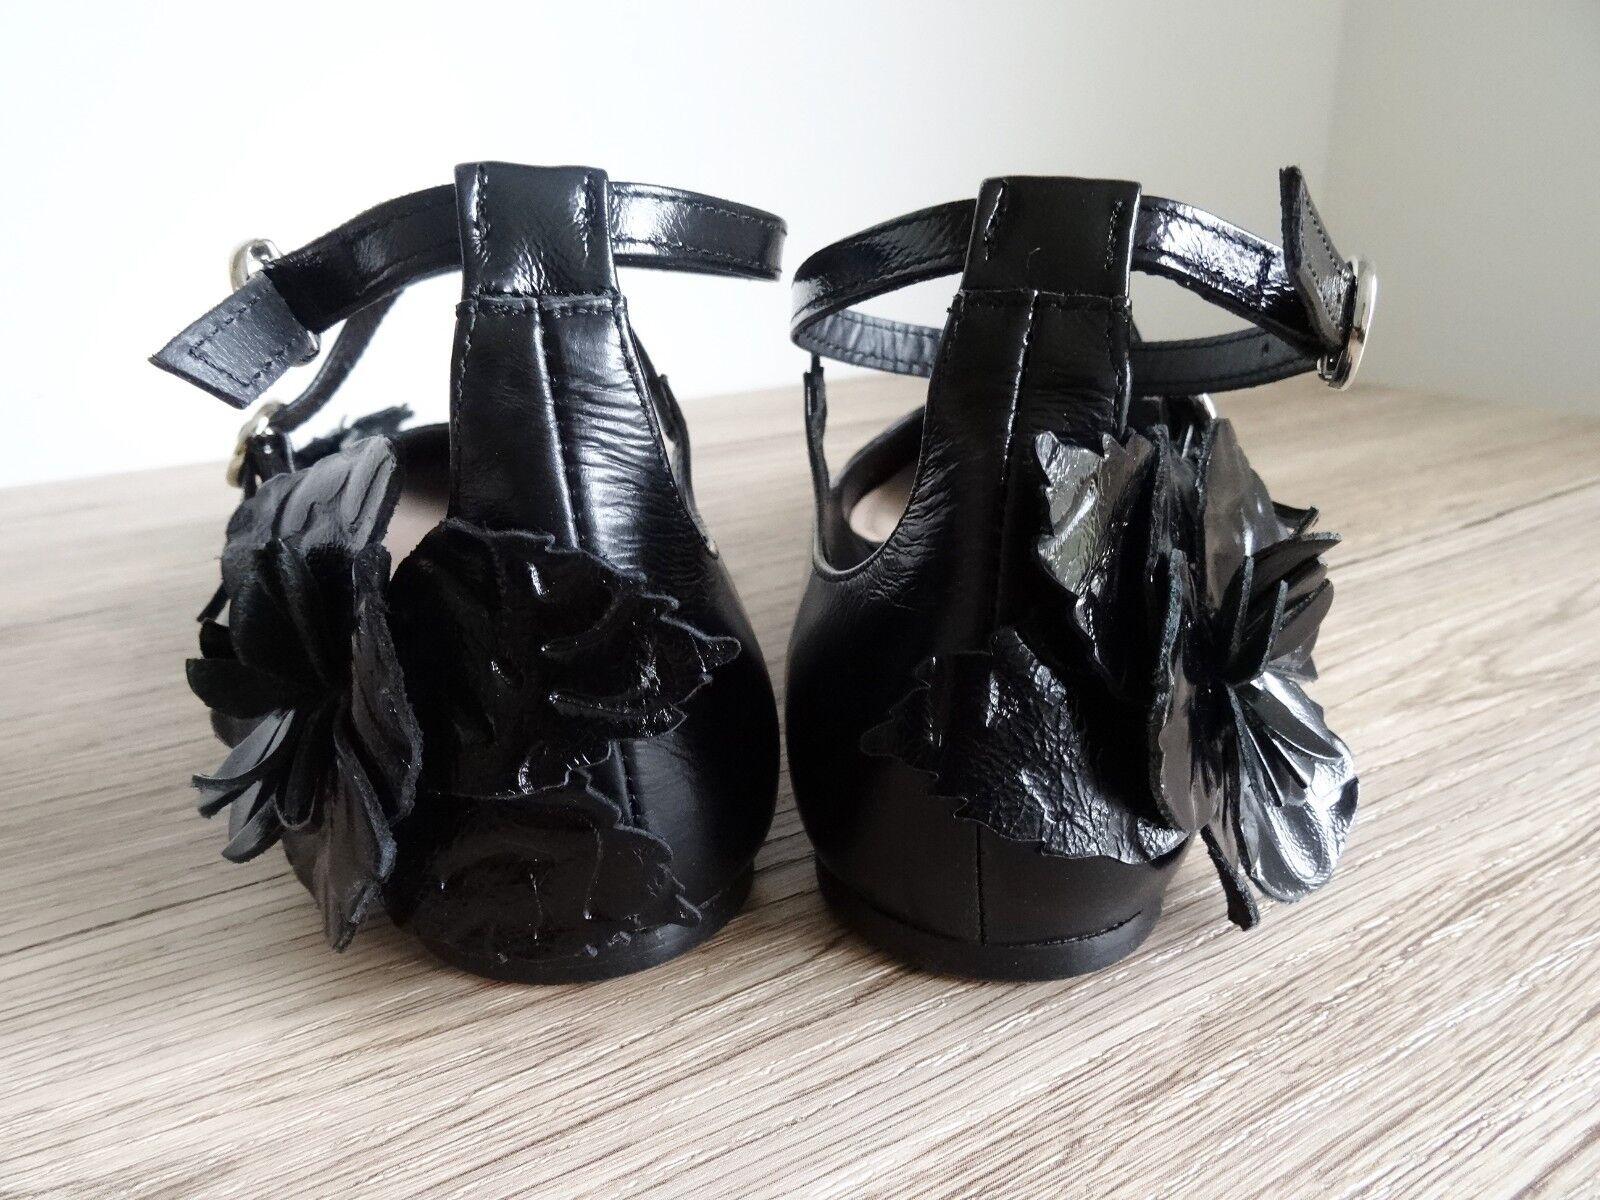 ZARA BLACK LEATHER BALLERINAS WITH STRAP & FLOWER DETAIL SIZE USA UK 8 EU 41 USA SIZE 10 f17045